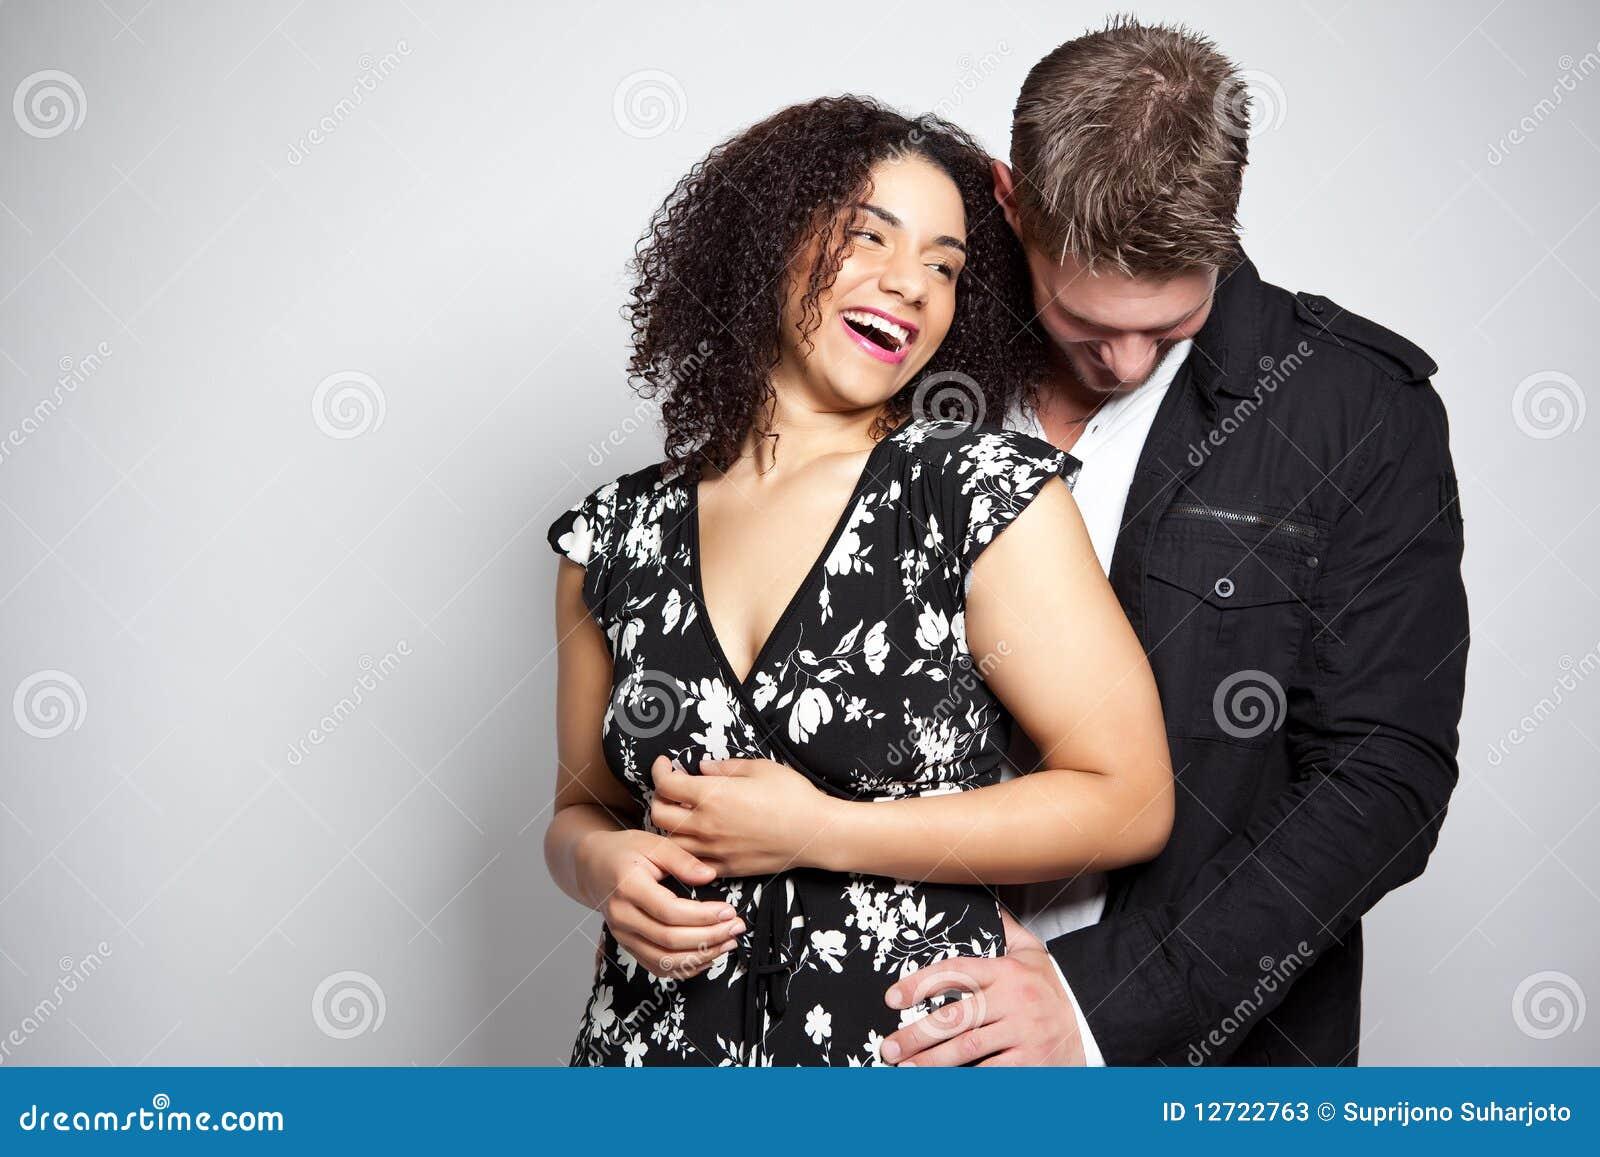 Romantic Interracial Cards 84